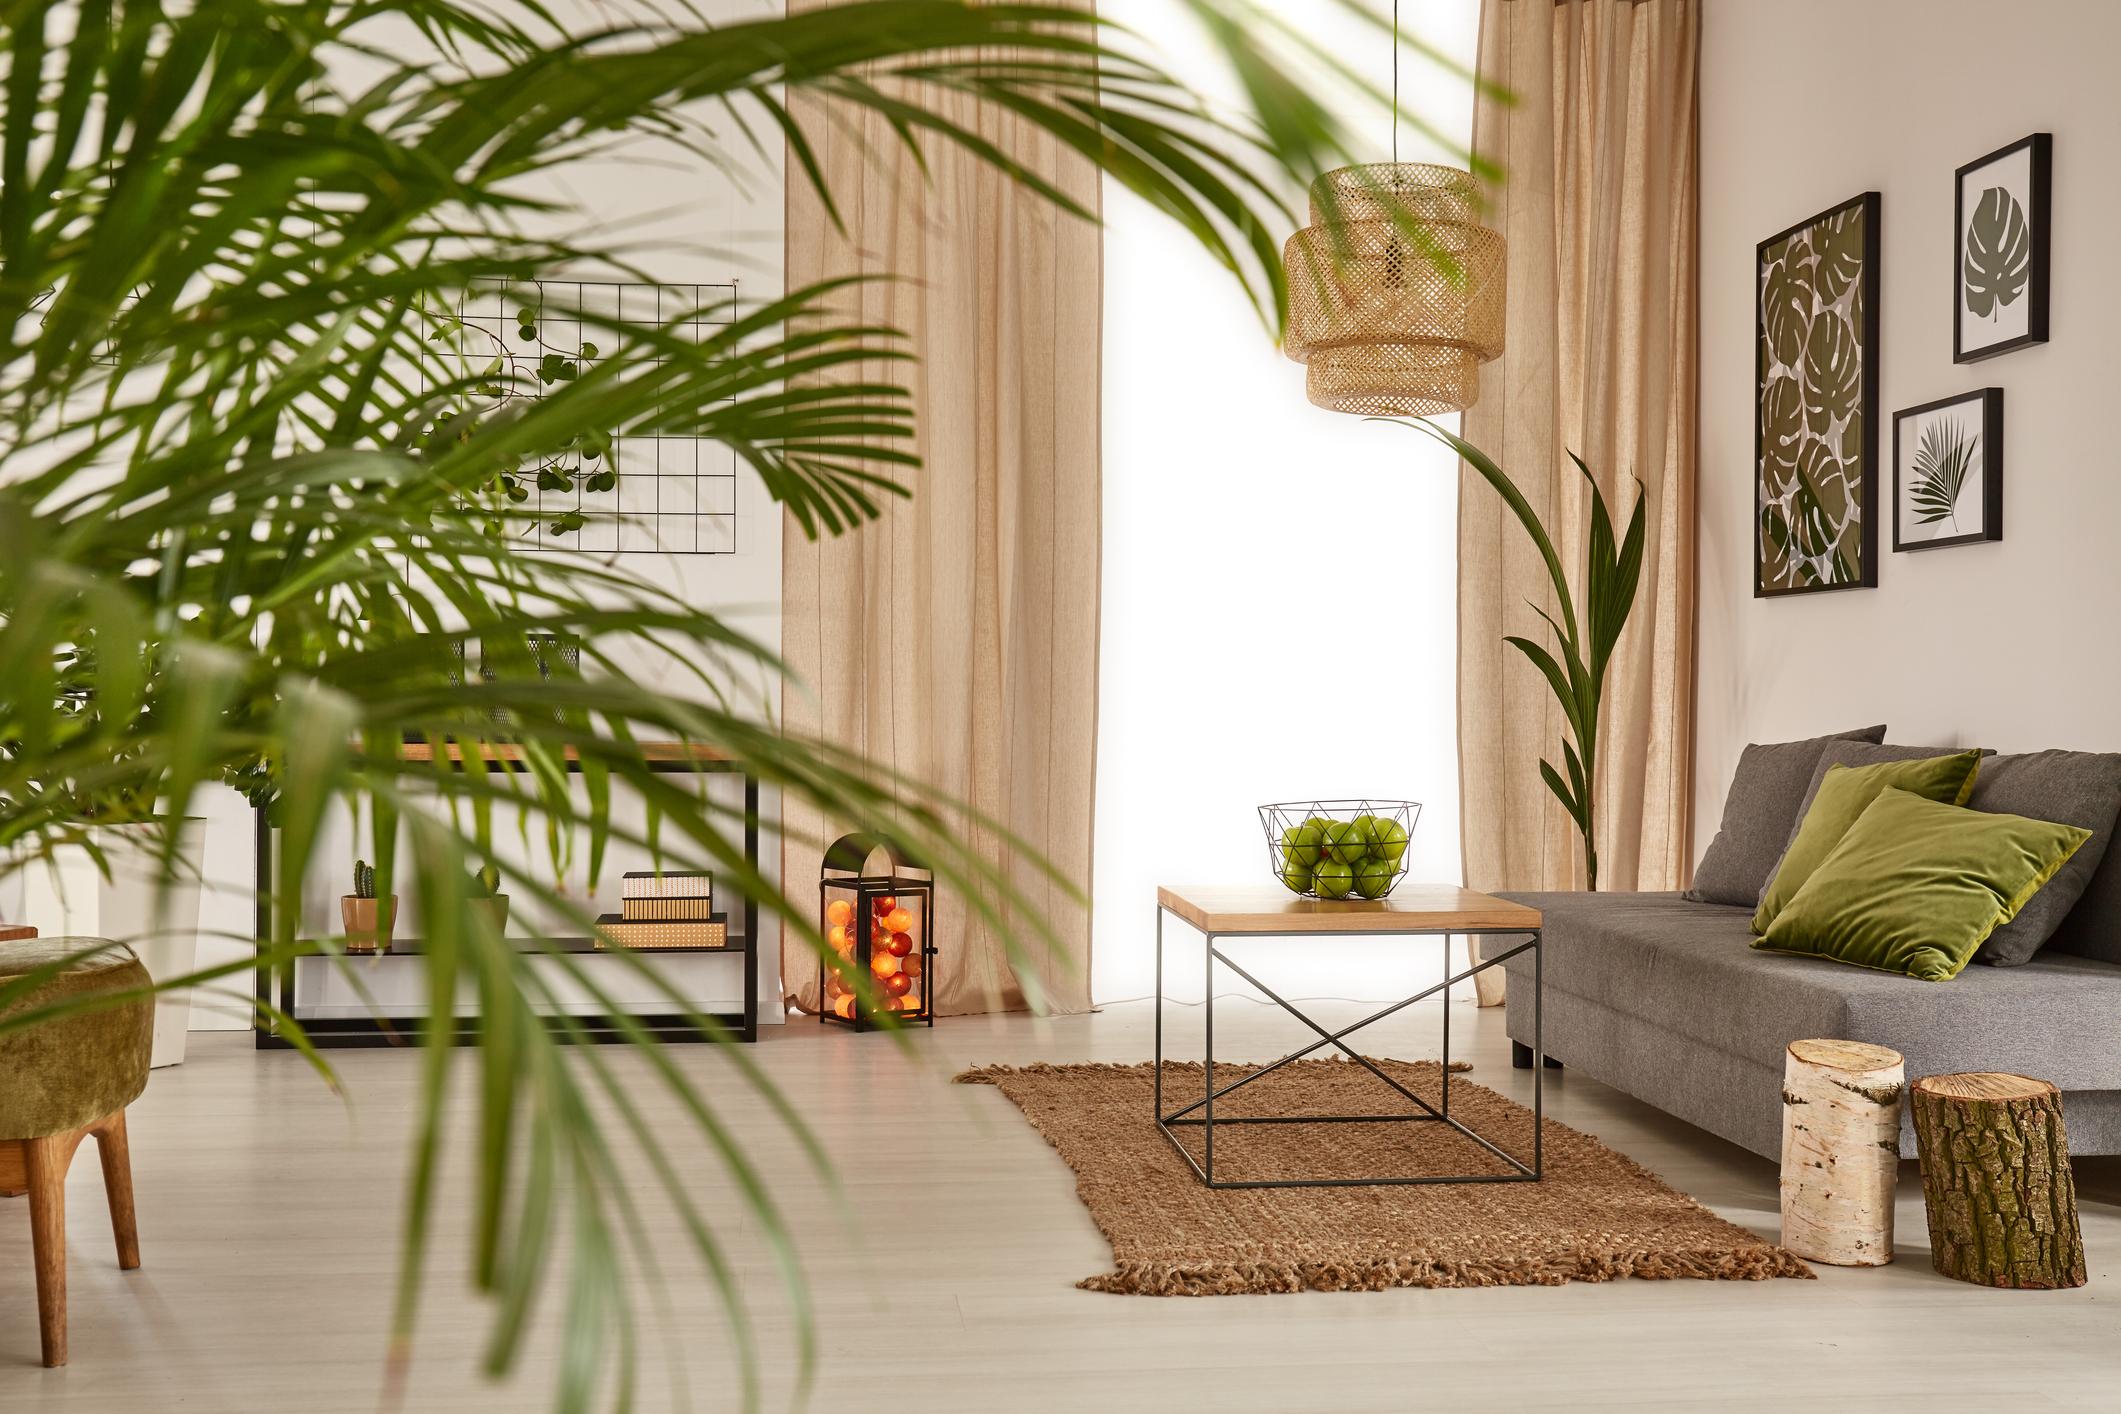 Living-room-with-decorative-palm-629863550_2125x1416.jpeg